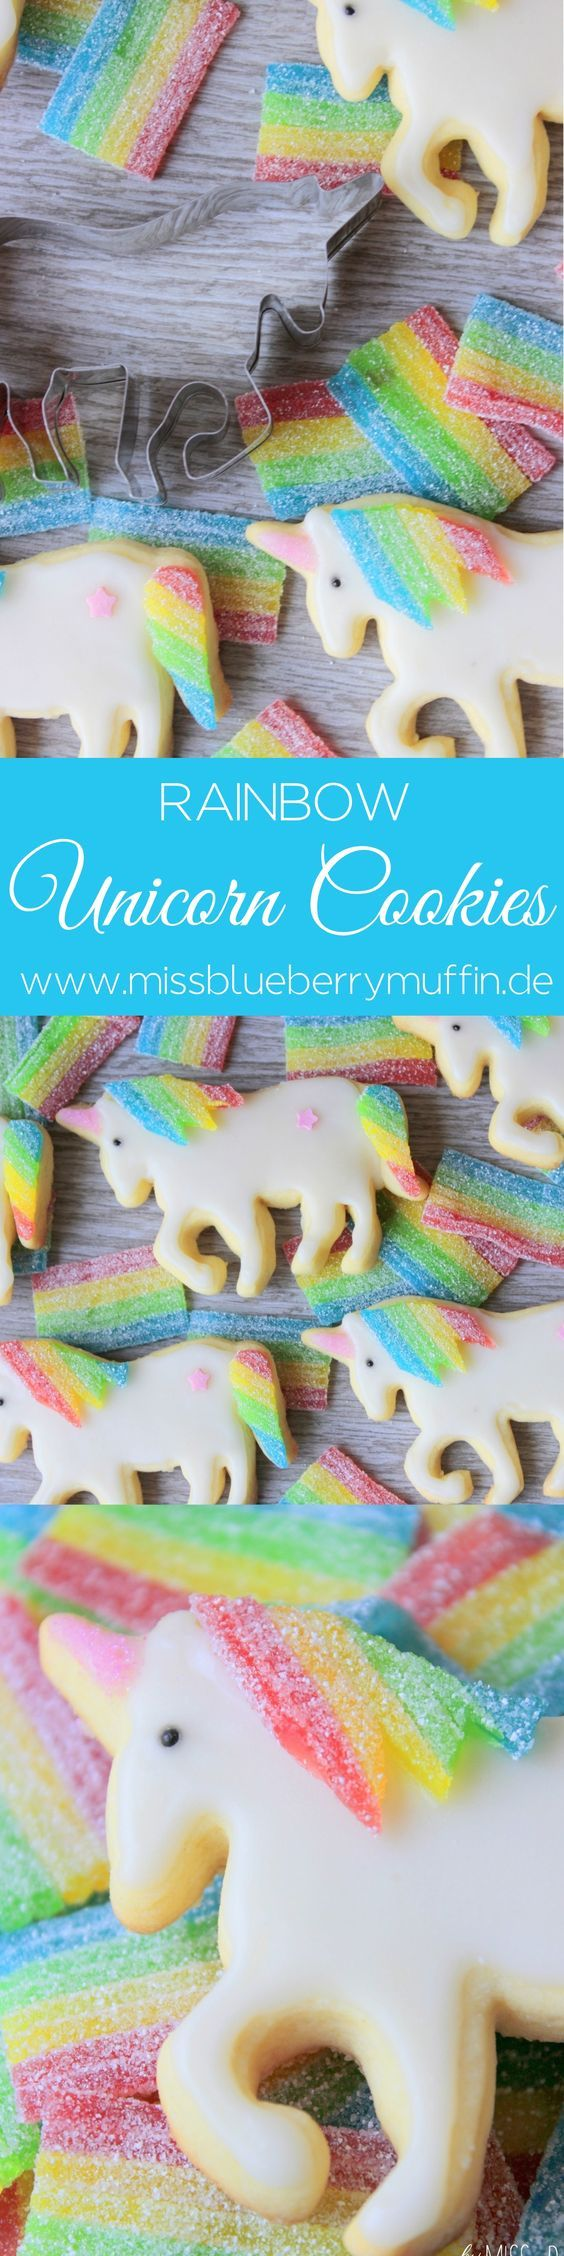 Regenbogen-Einhorn-Cookies! Süßer geht es nicht! ? // Rainbow Unicorn Cookies